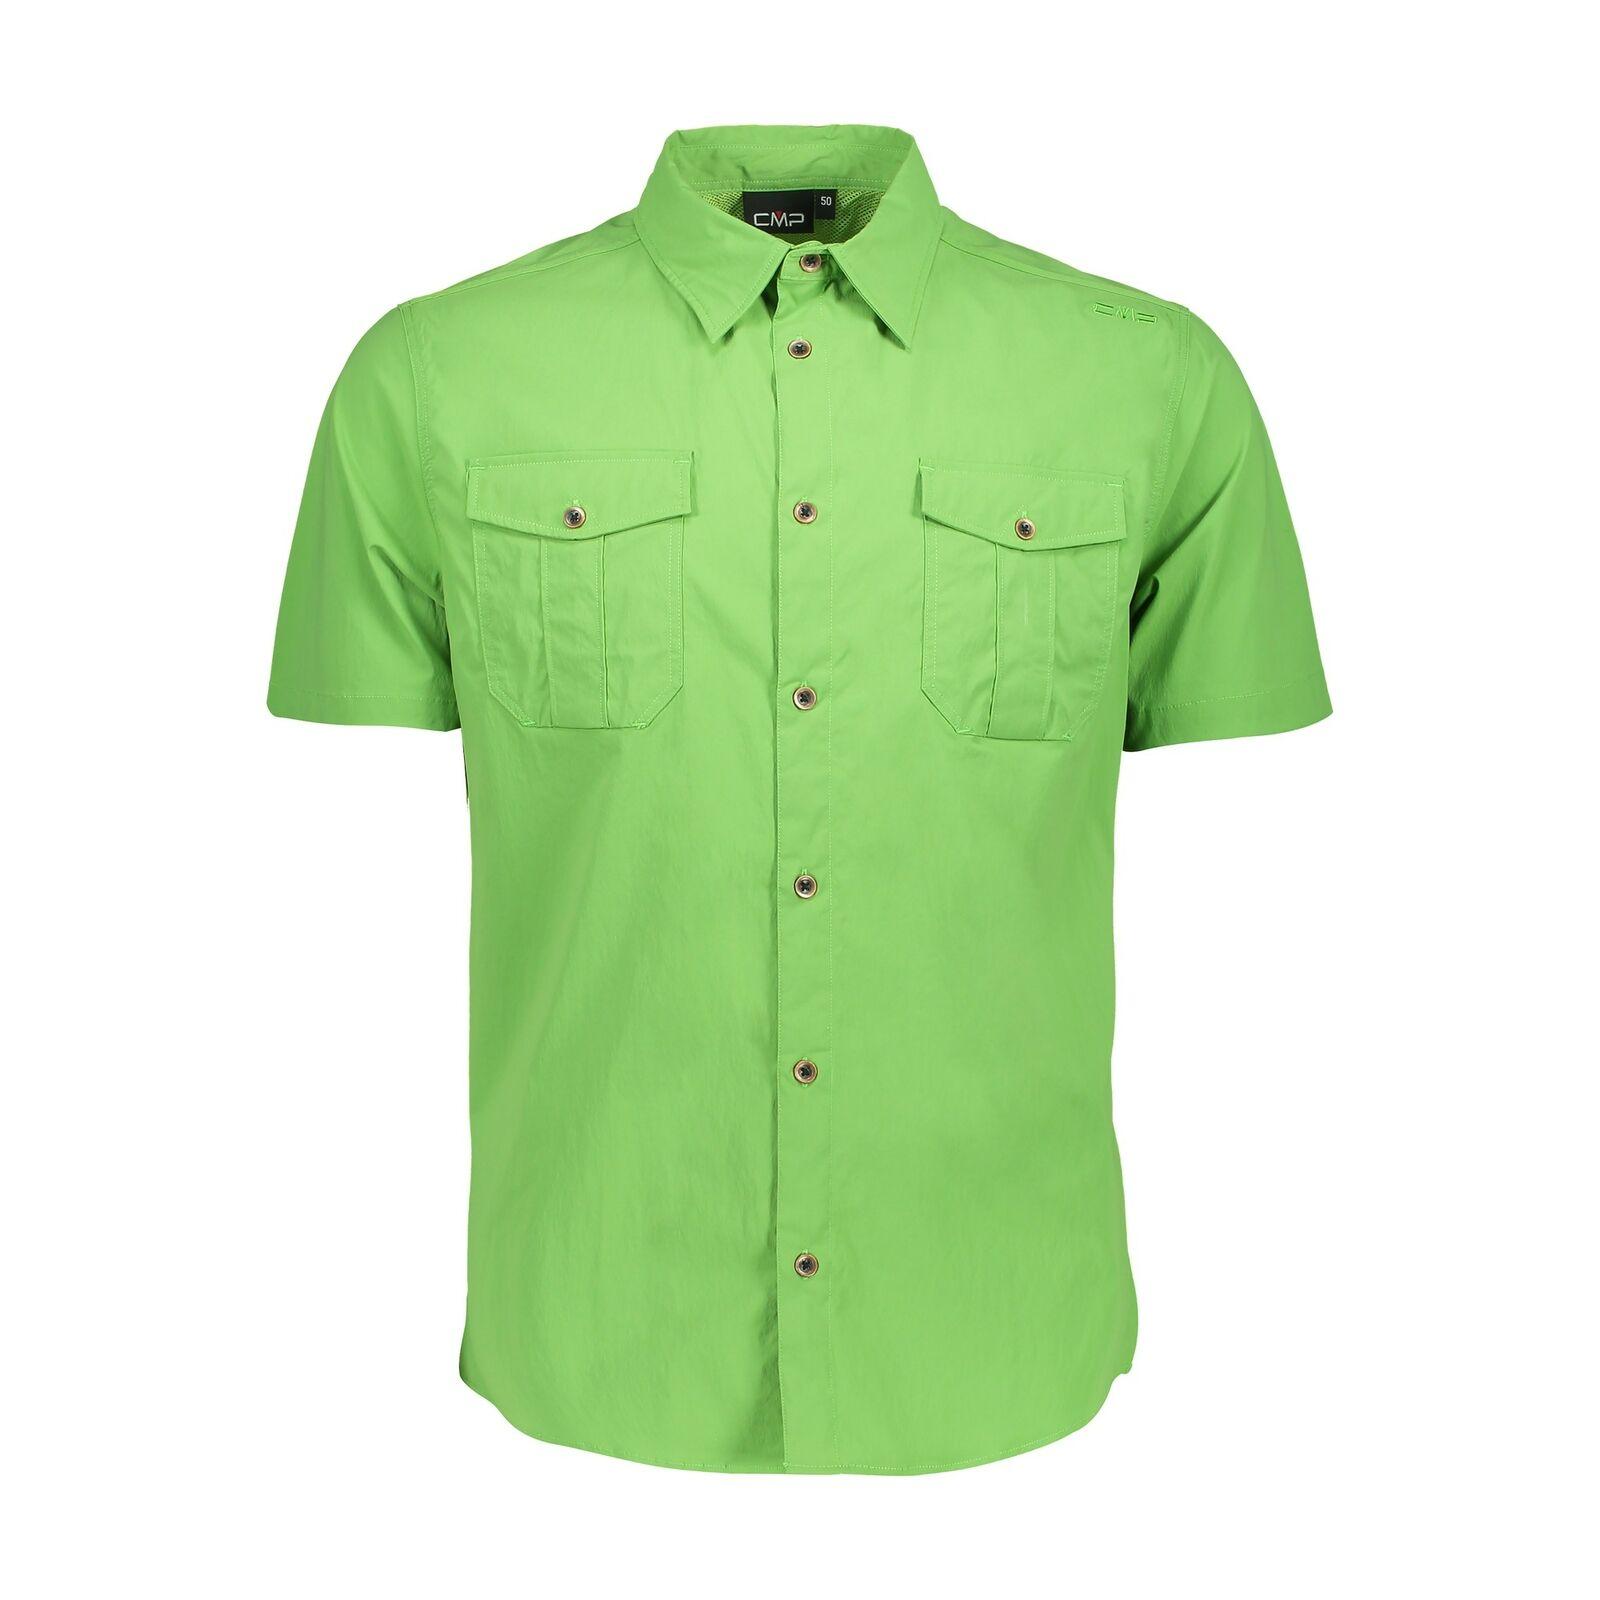 CMP Camicia Man Shirt verde Idrorepellente Traspirante Elastico Antibatterico